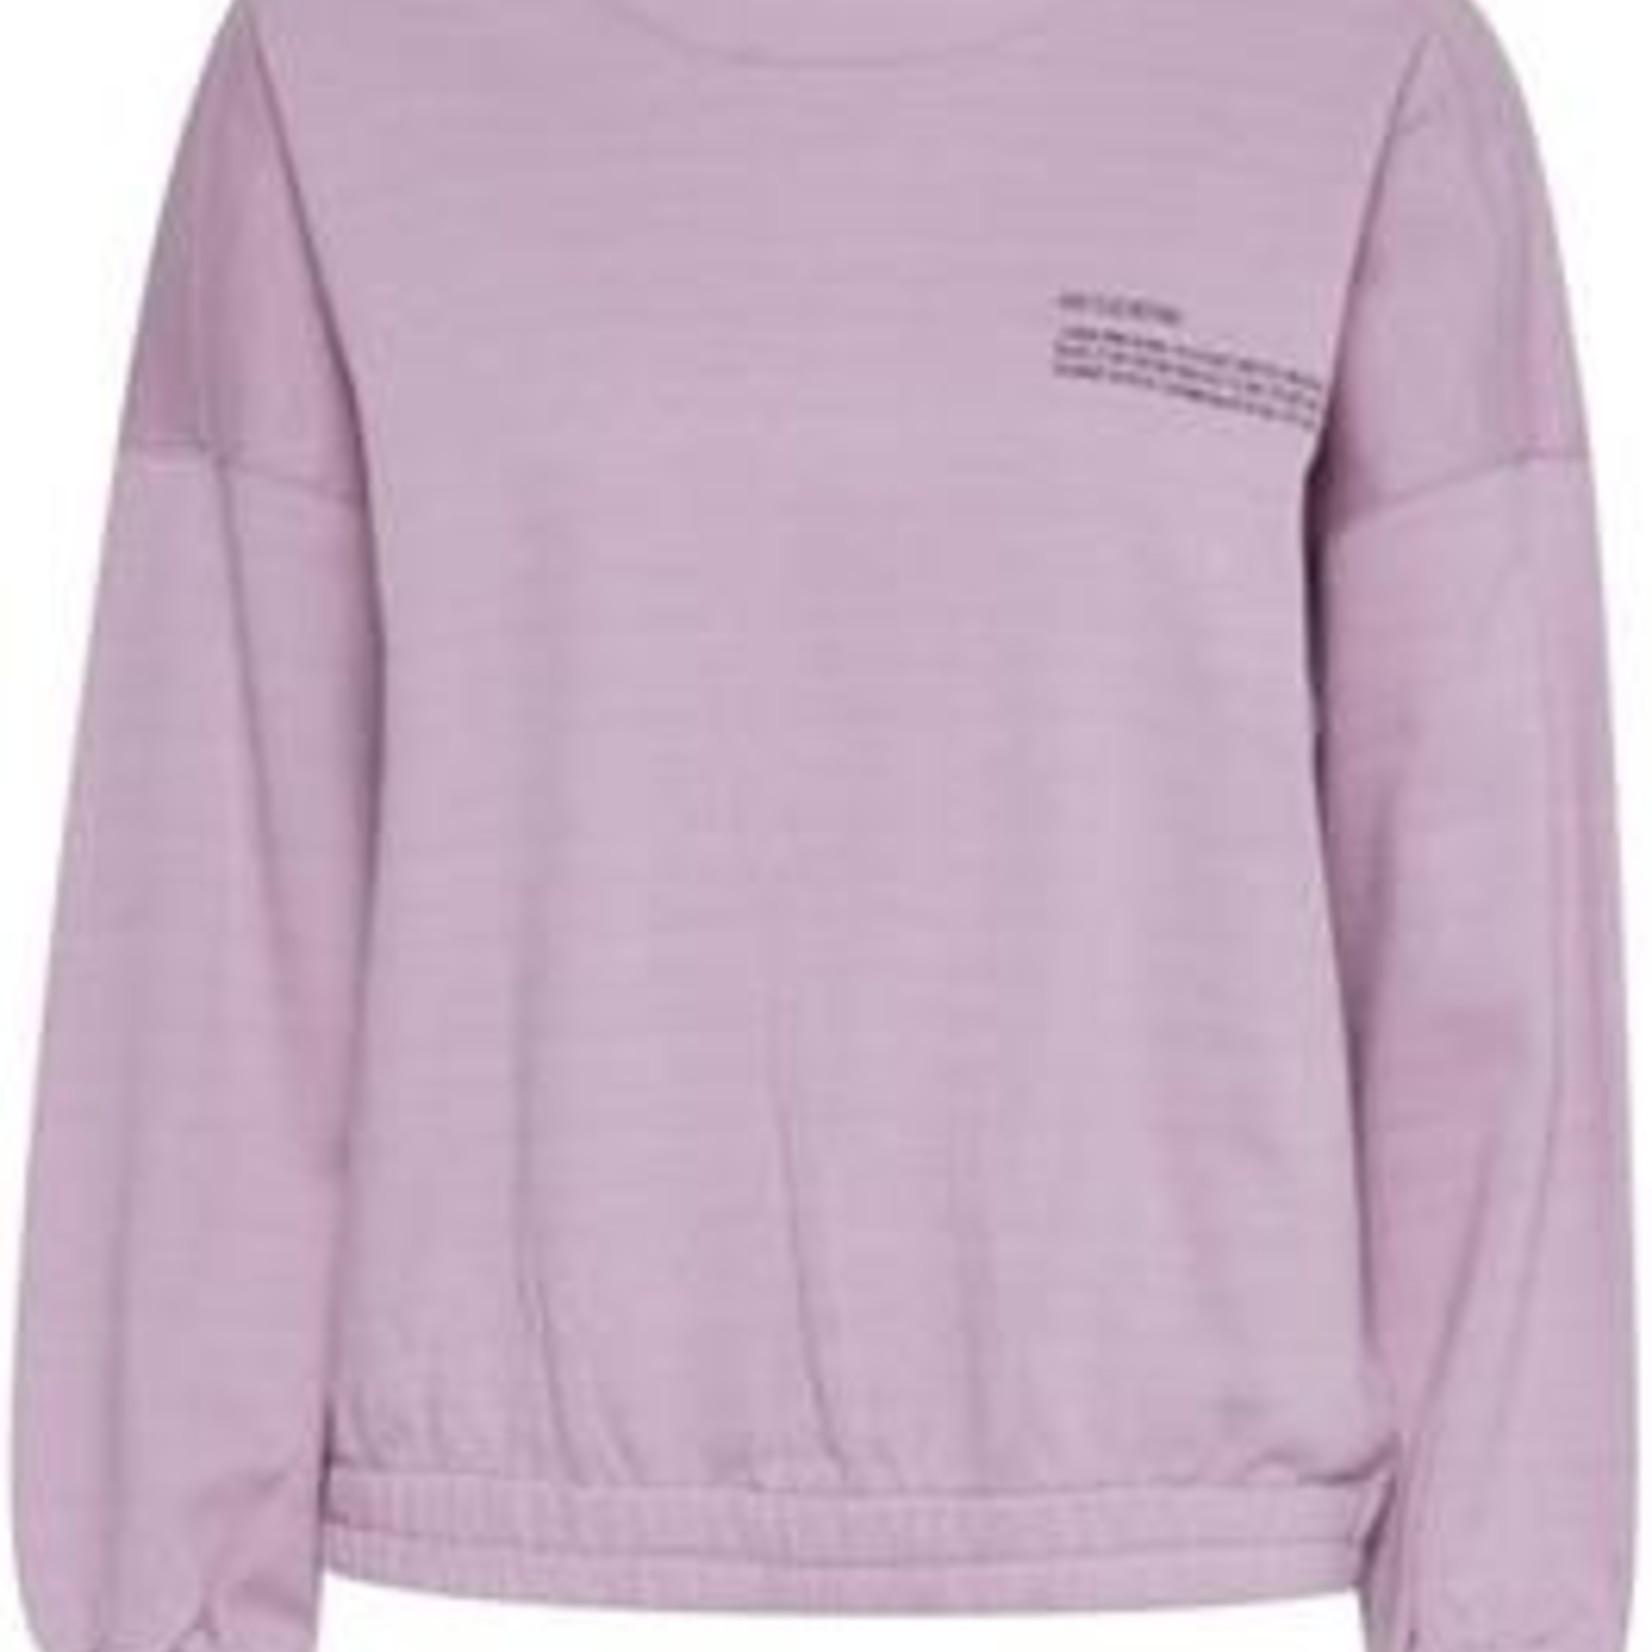 ICHI IHKAWI, sweater